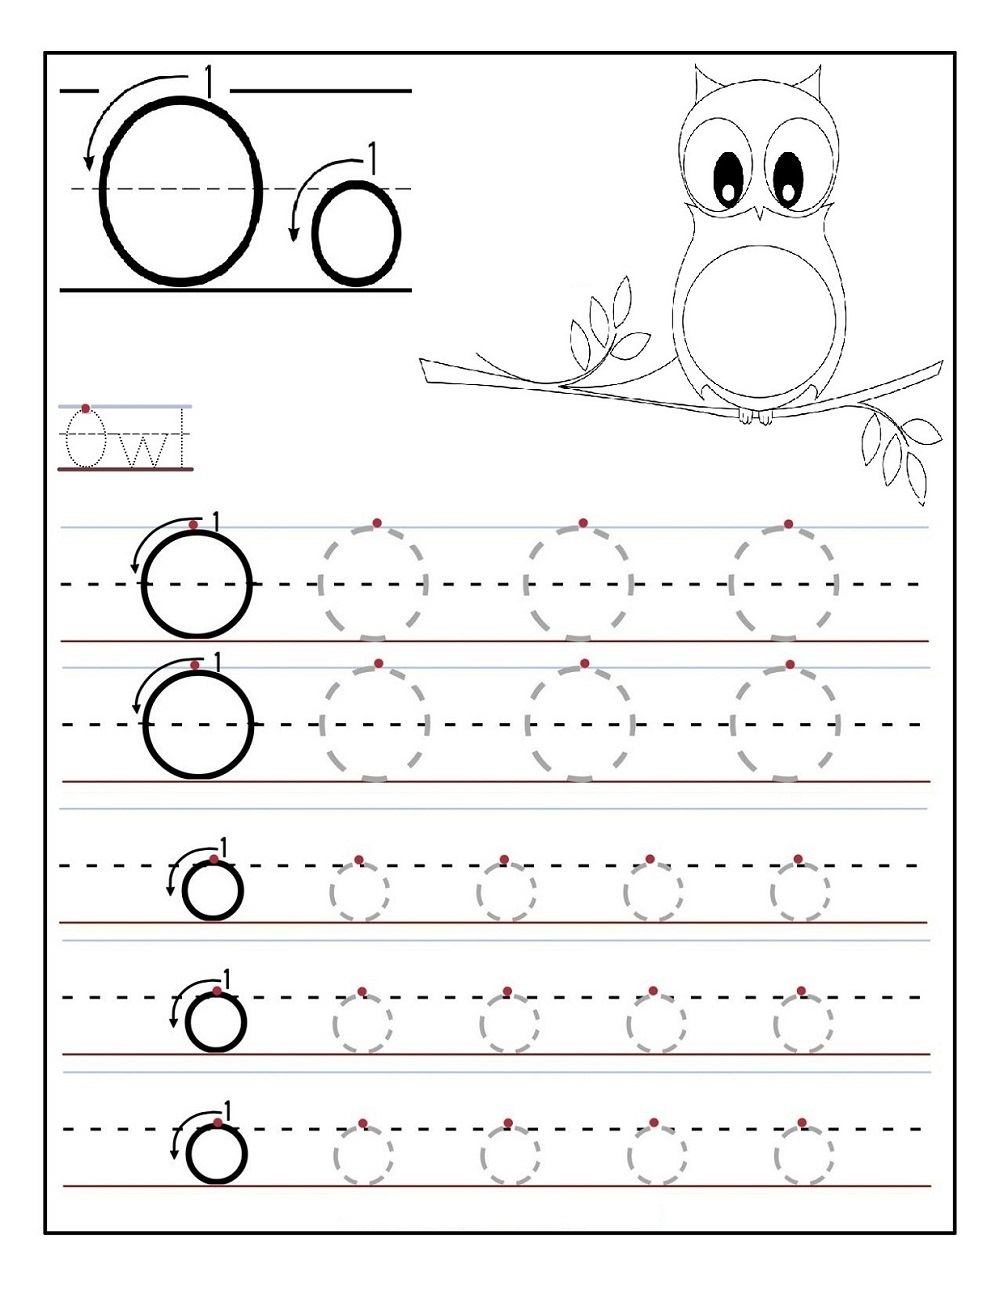 Tracing Letter O Worksheets | Activity Shelter inside Tracing Letter O Worksheets